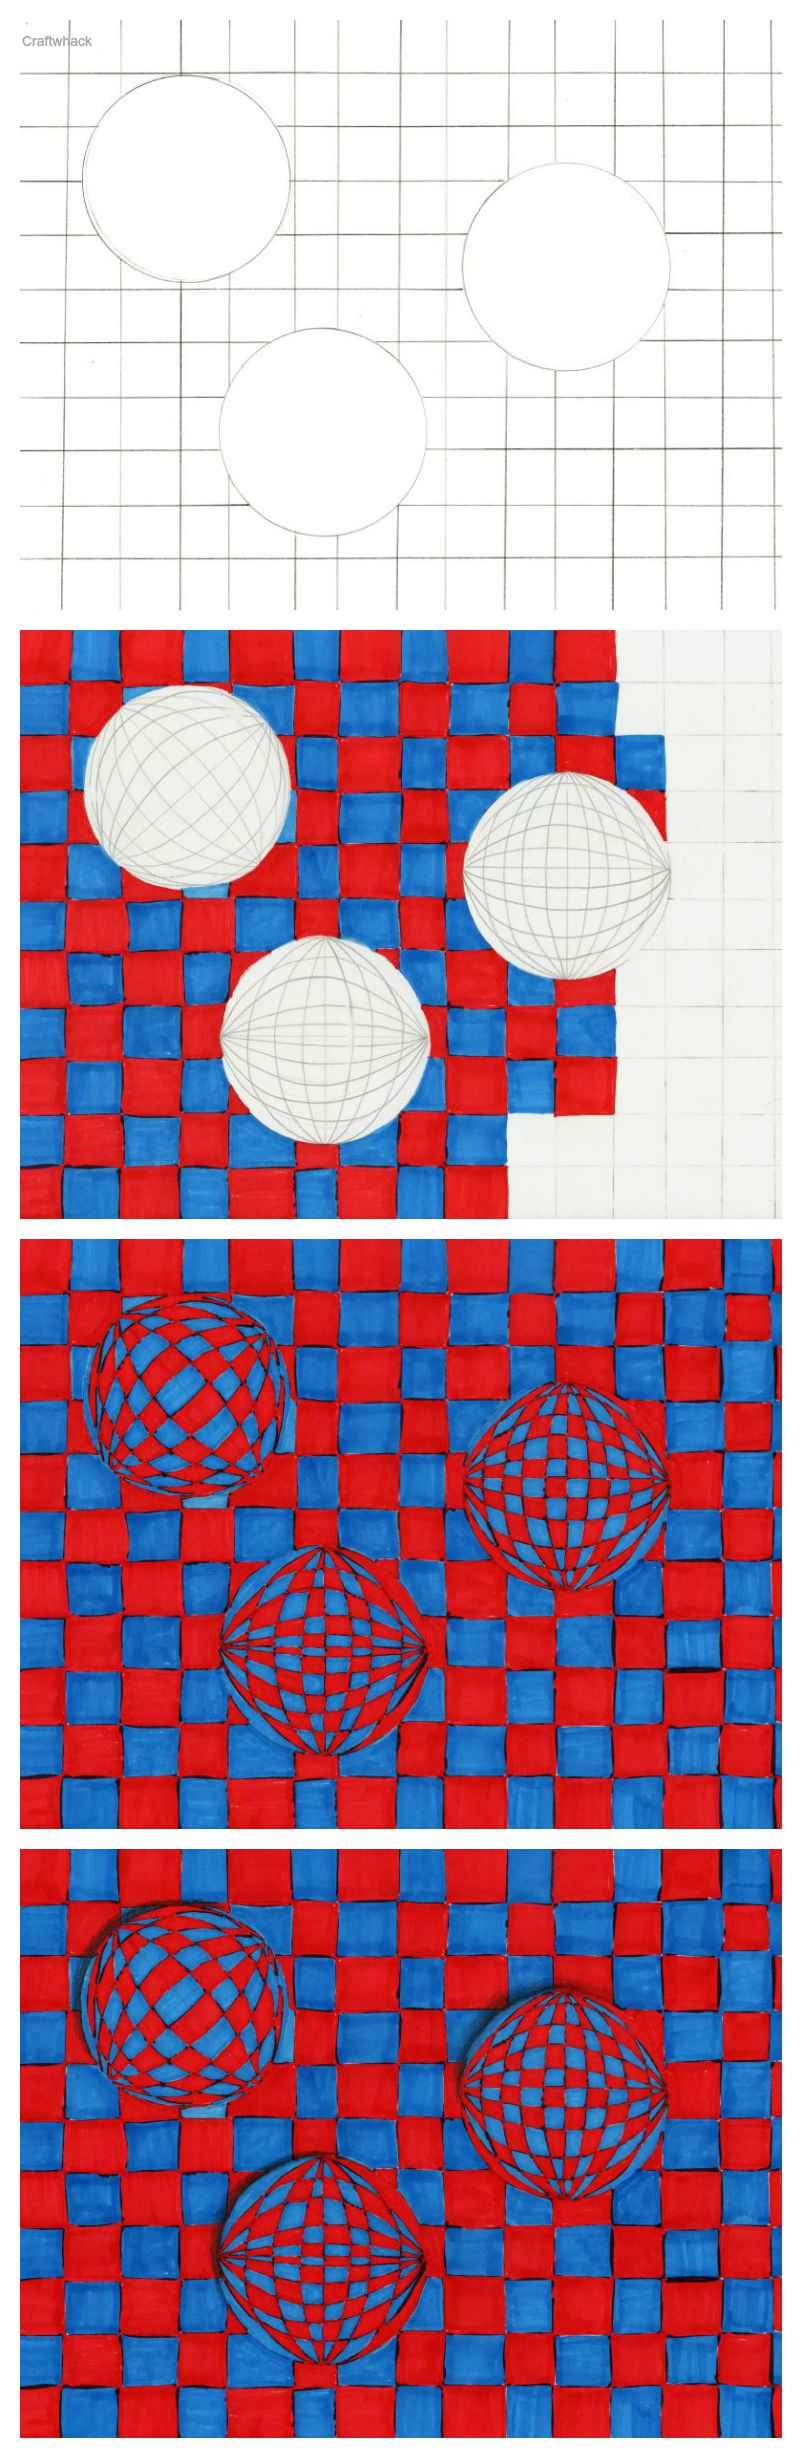 Drawn optical illusion cool pop Cool Sphere art Drawings Sphere